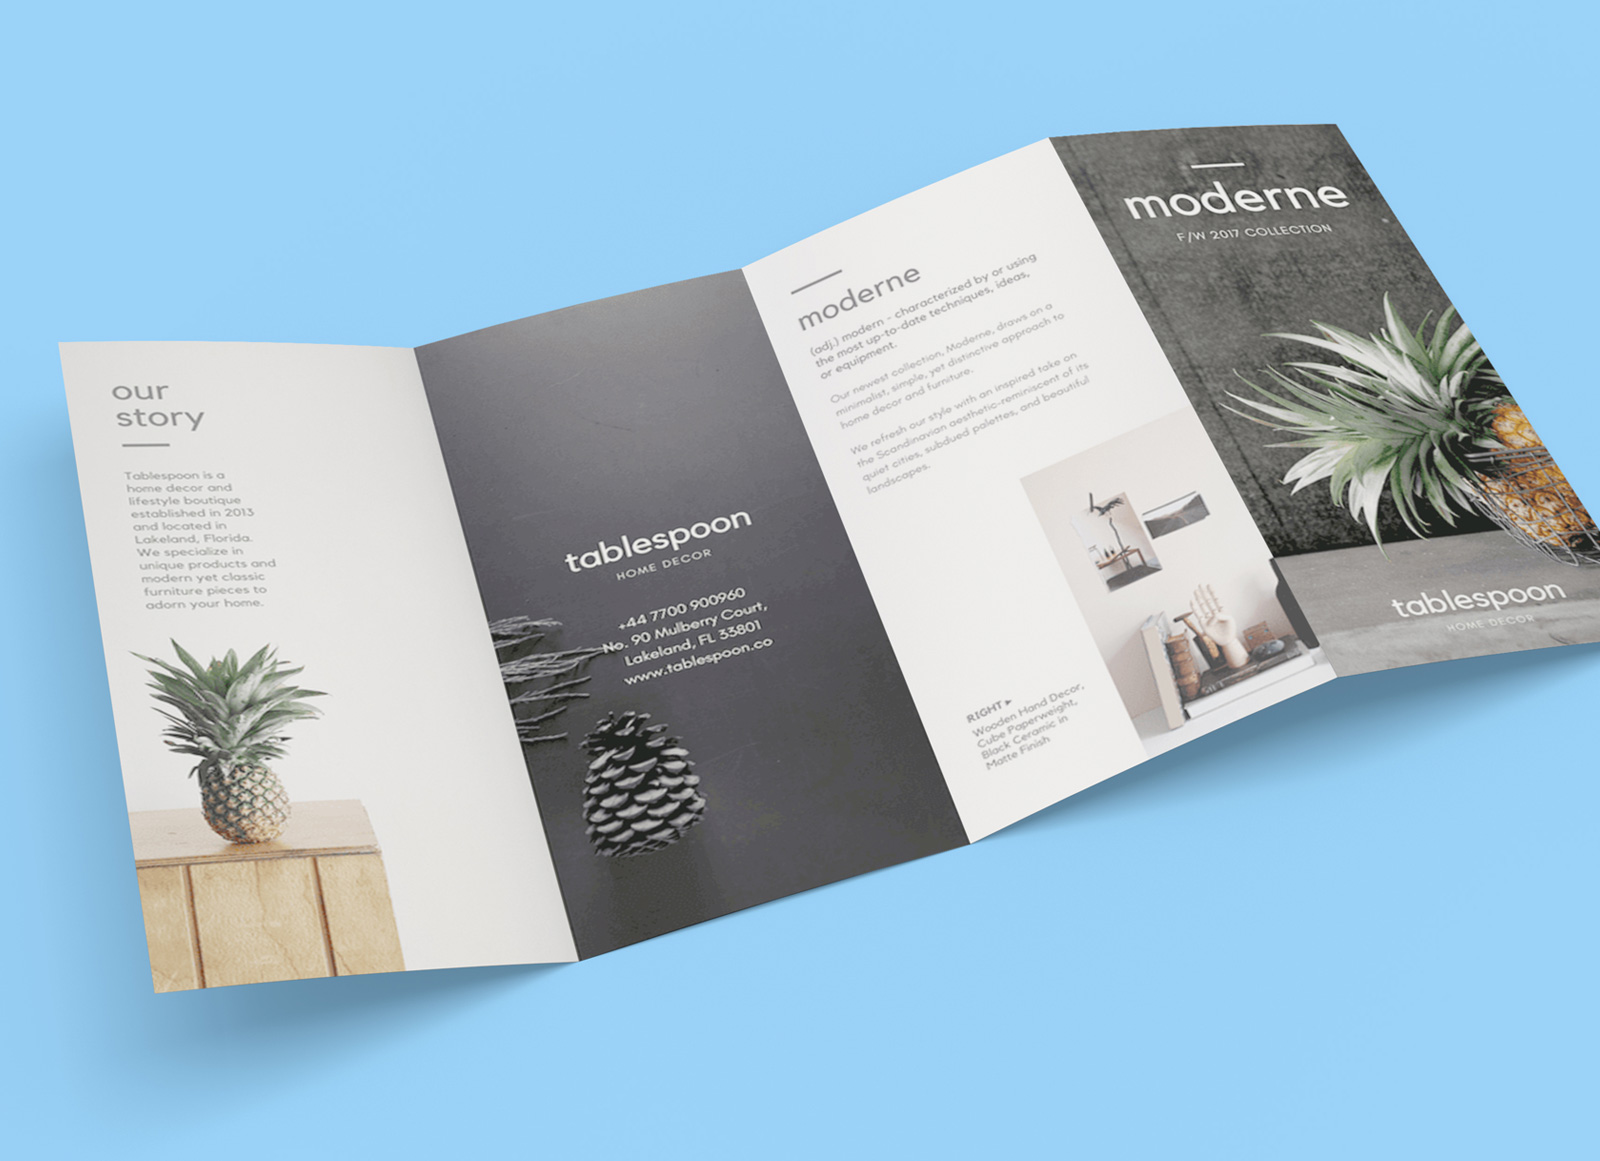 brochure mock up template - free 4 panel quad fold brochure mockup psd good mockups